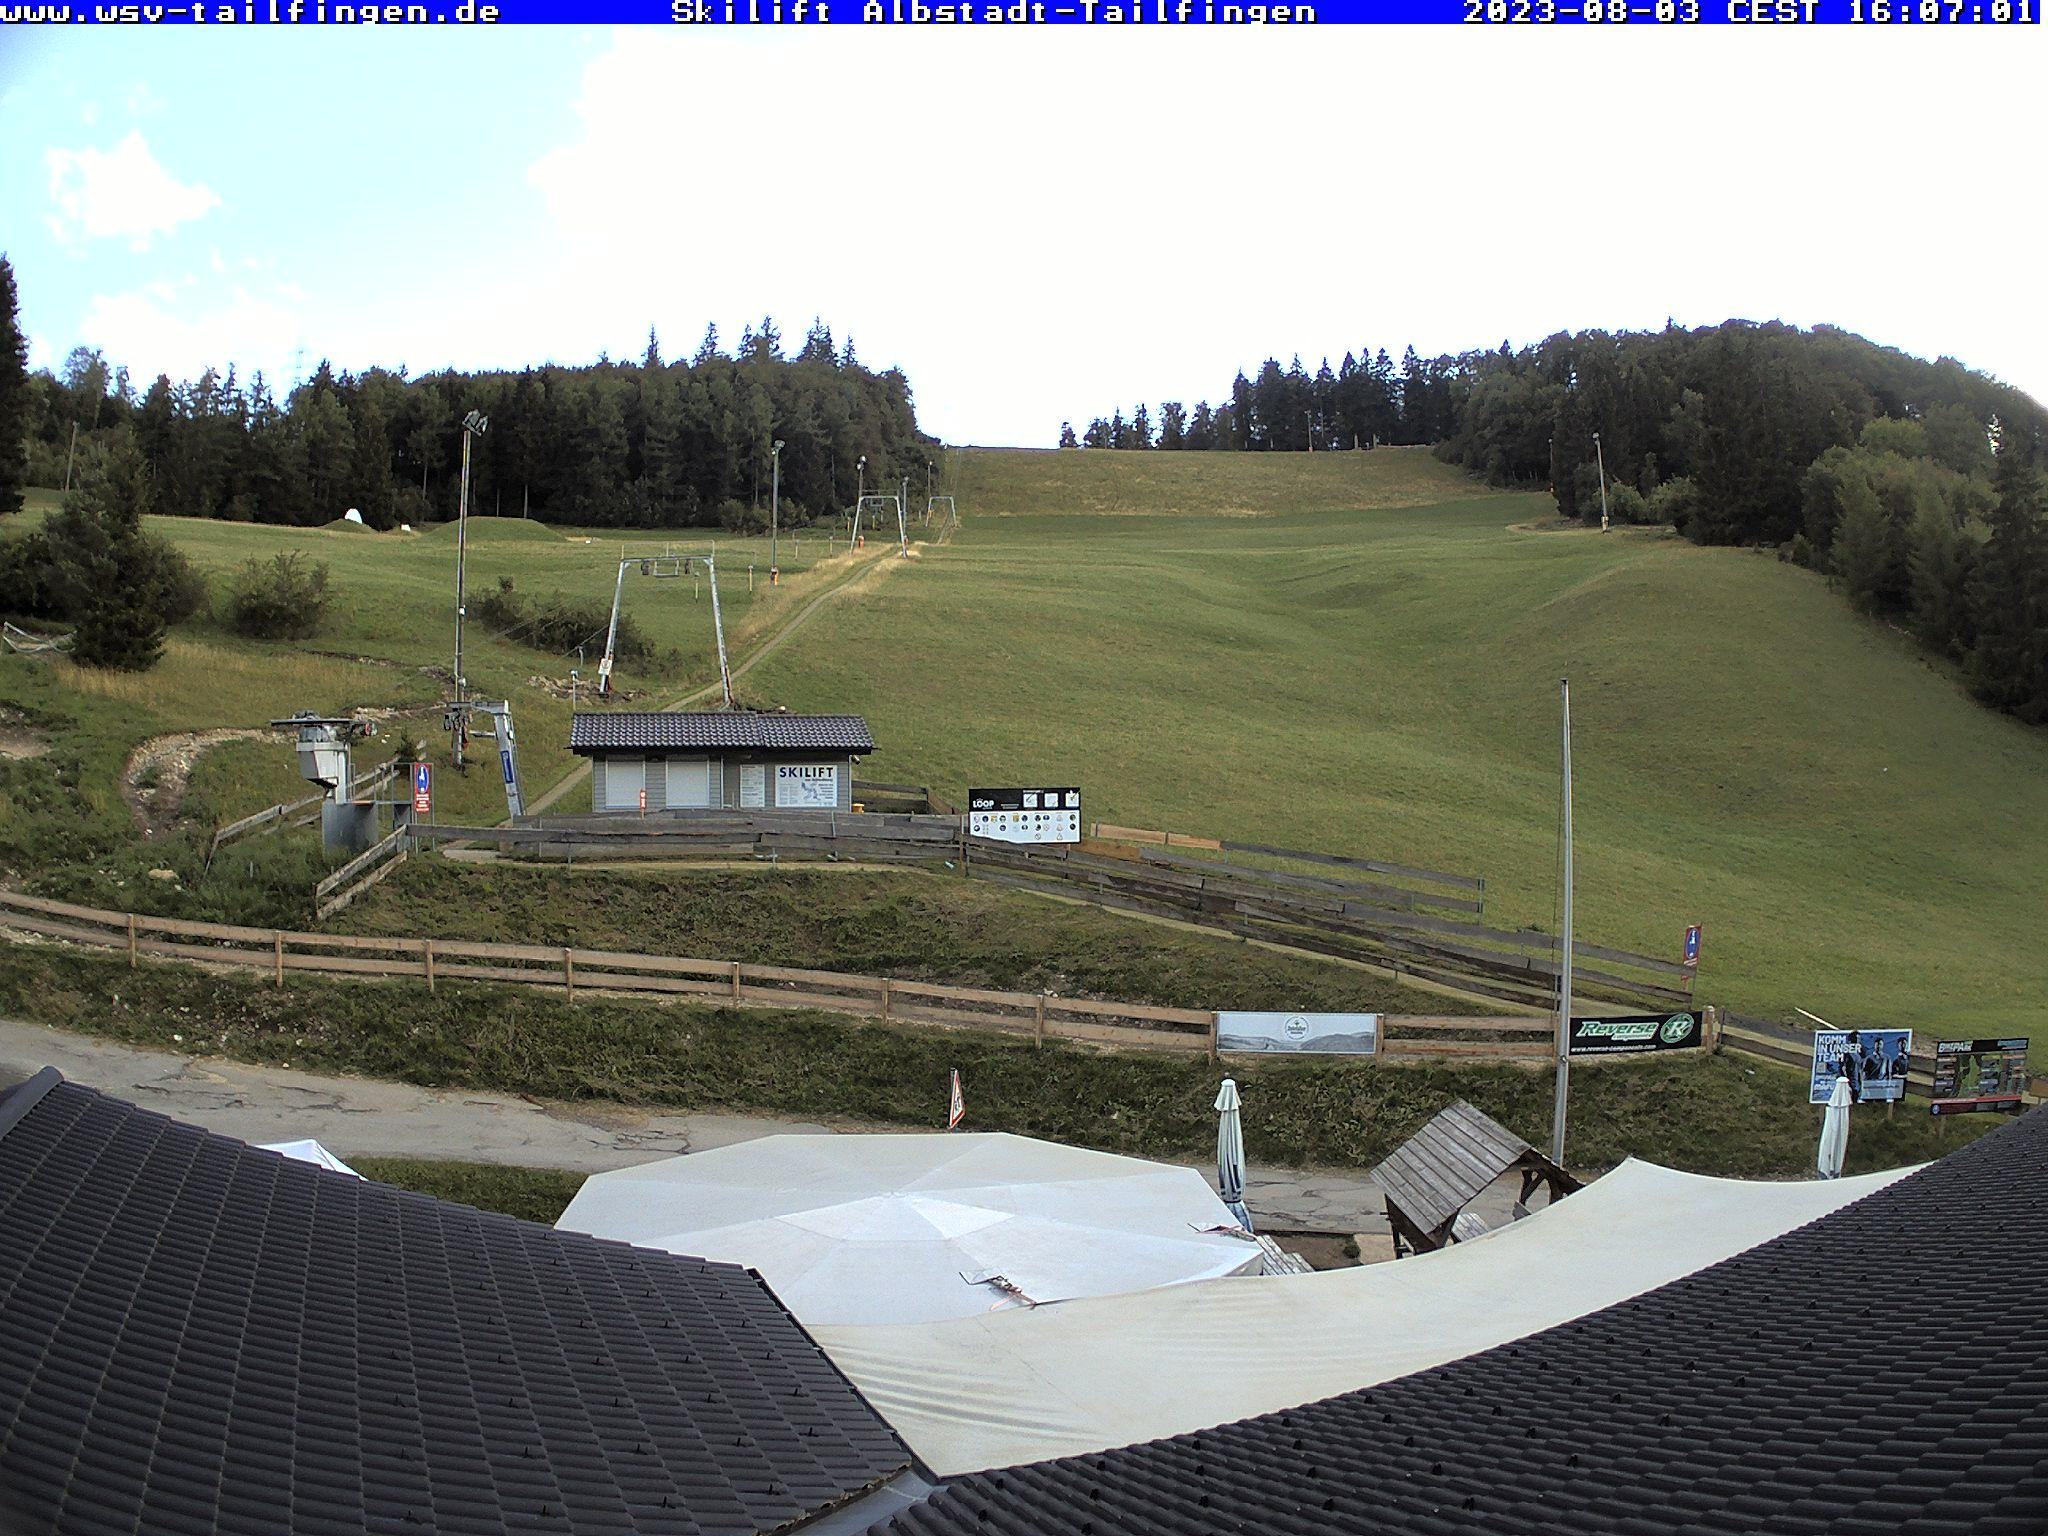 Webcam Ski Resort Albstadt - Tailfingen Swabian Jura